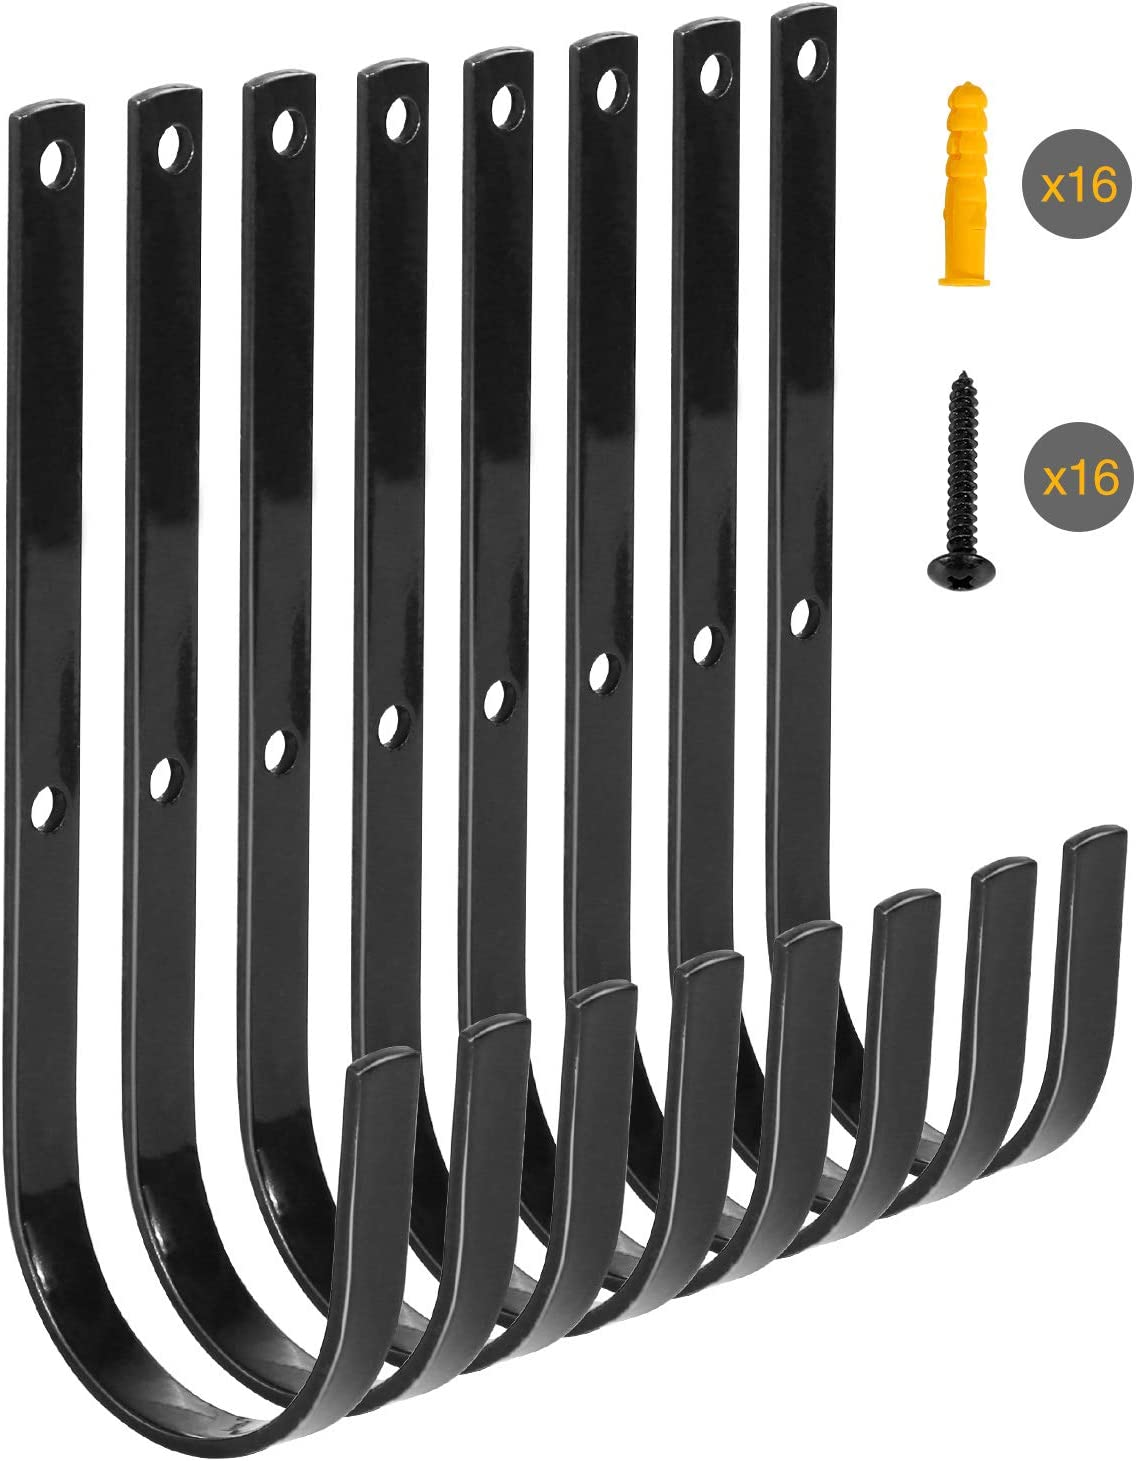 Redcamp Black Iron Heavy Duty Storage Utility Hooks,Set of 8,Large Garage Hooks Wall Mount for Hanging Storage Garden Tools